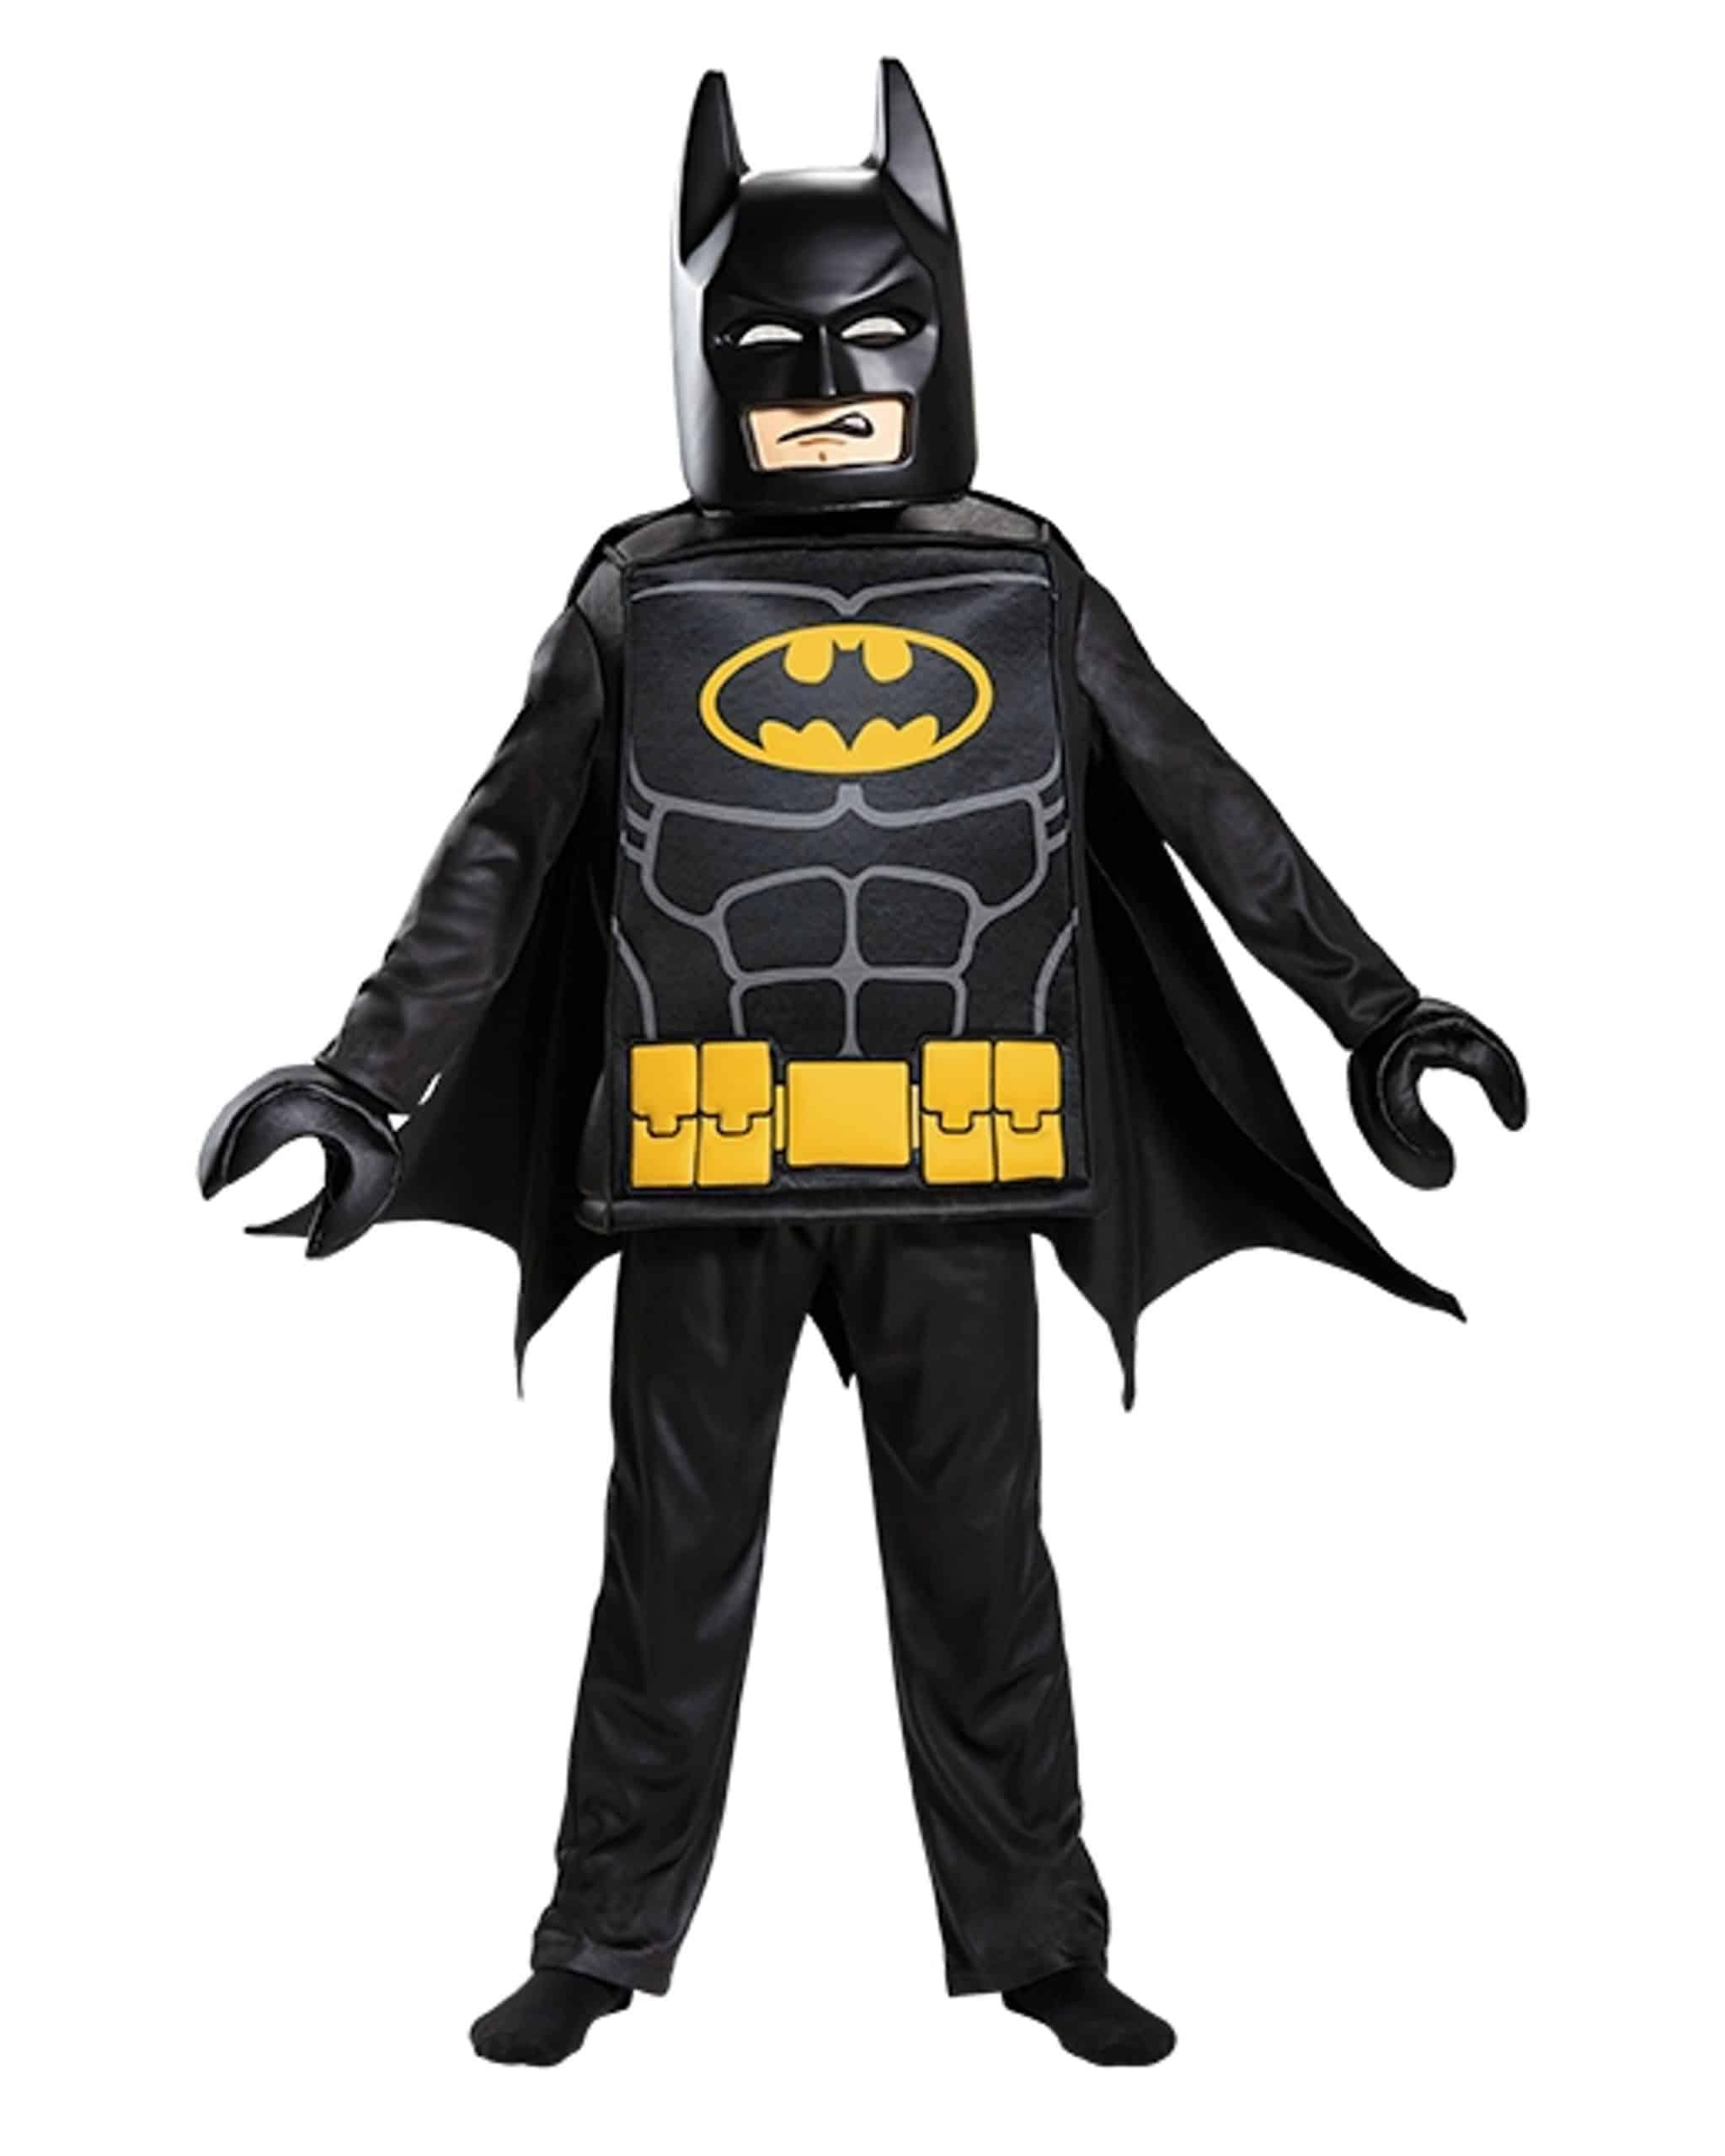 lego 5006027 batman luksuskostume scaled